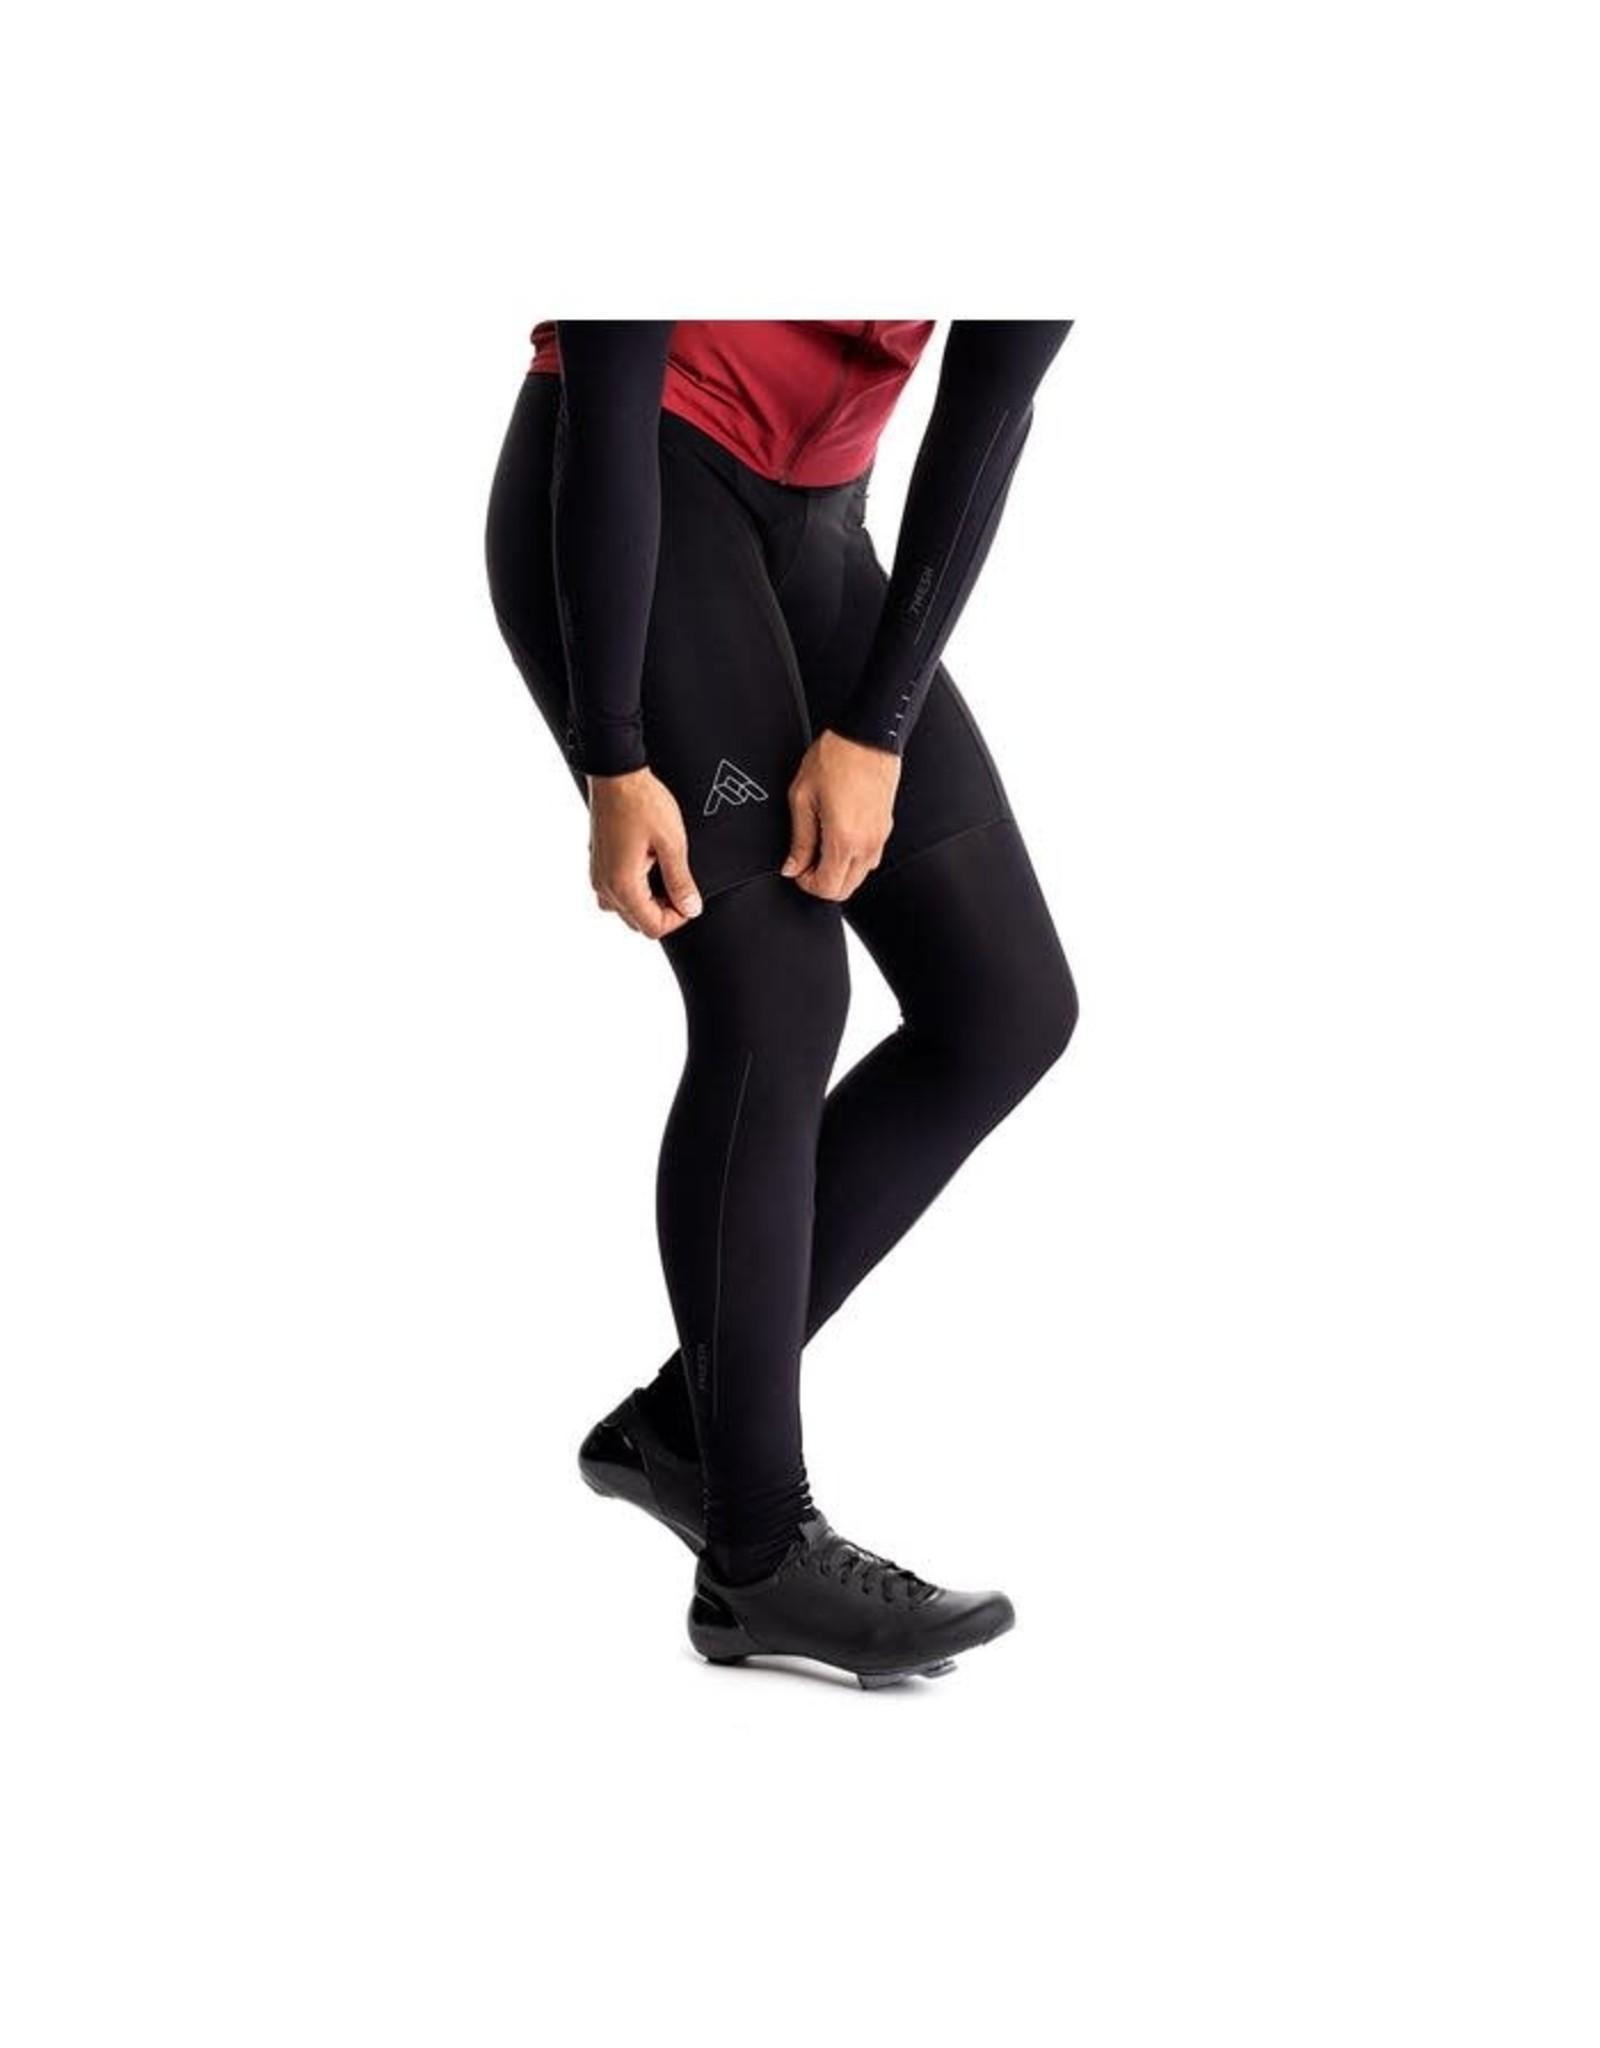 7MESH 7MESH - Colorado Leg Warmers Black Med